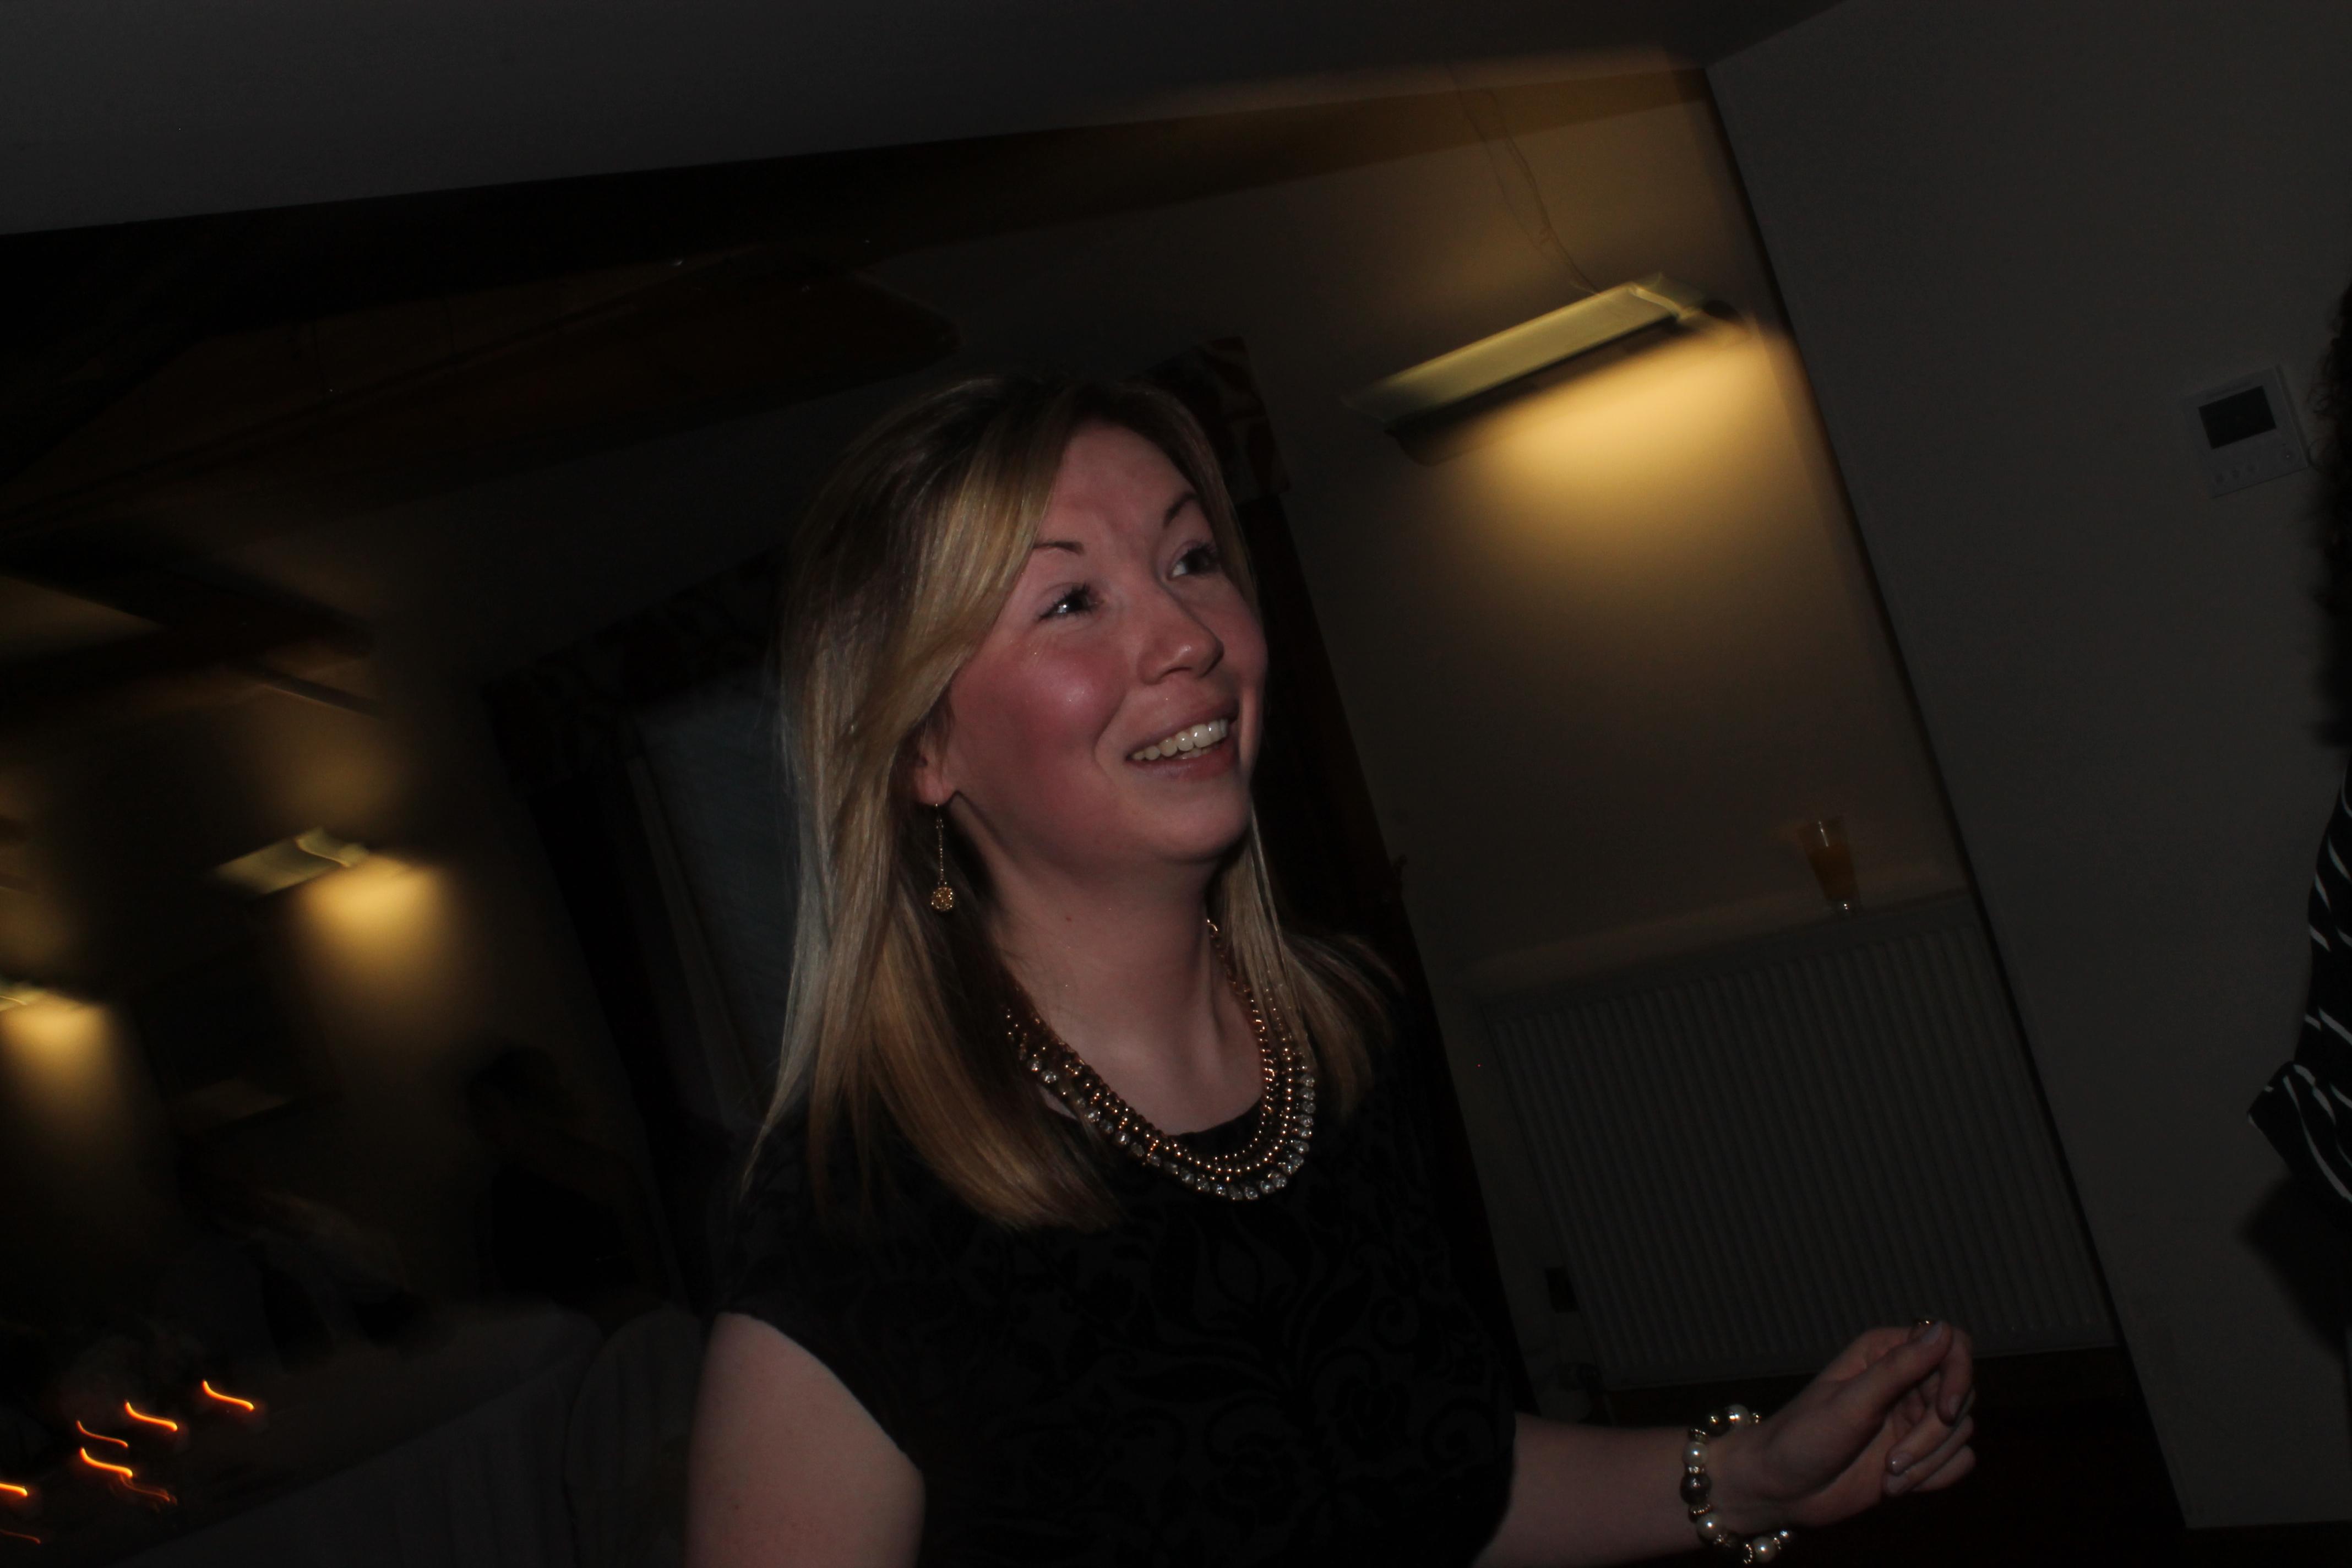 Dundee bridesmaid